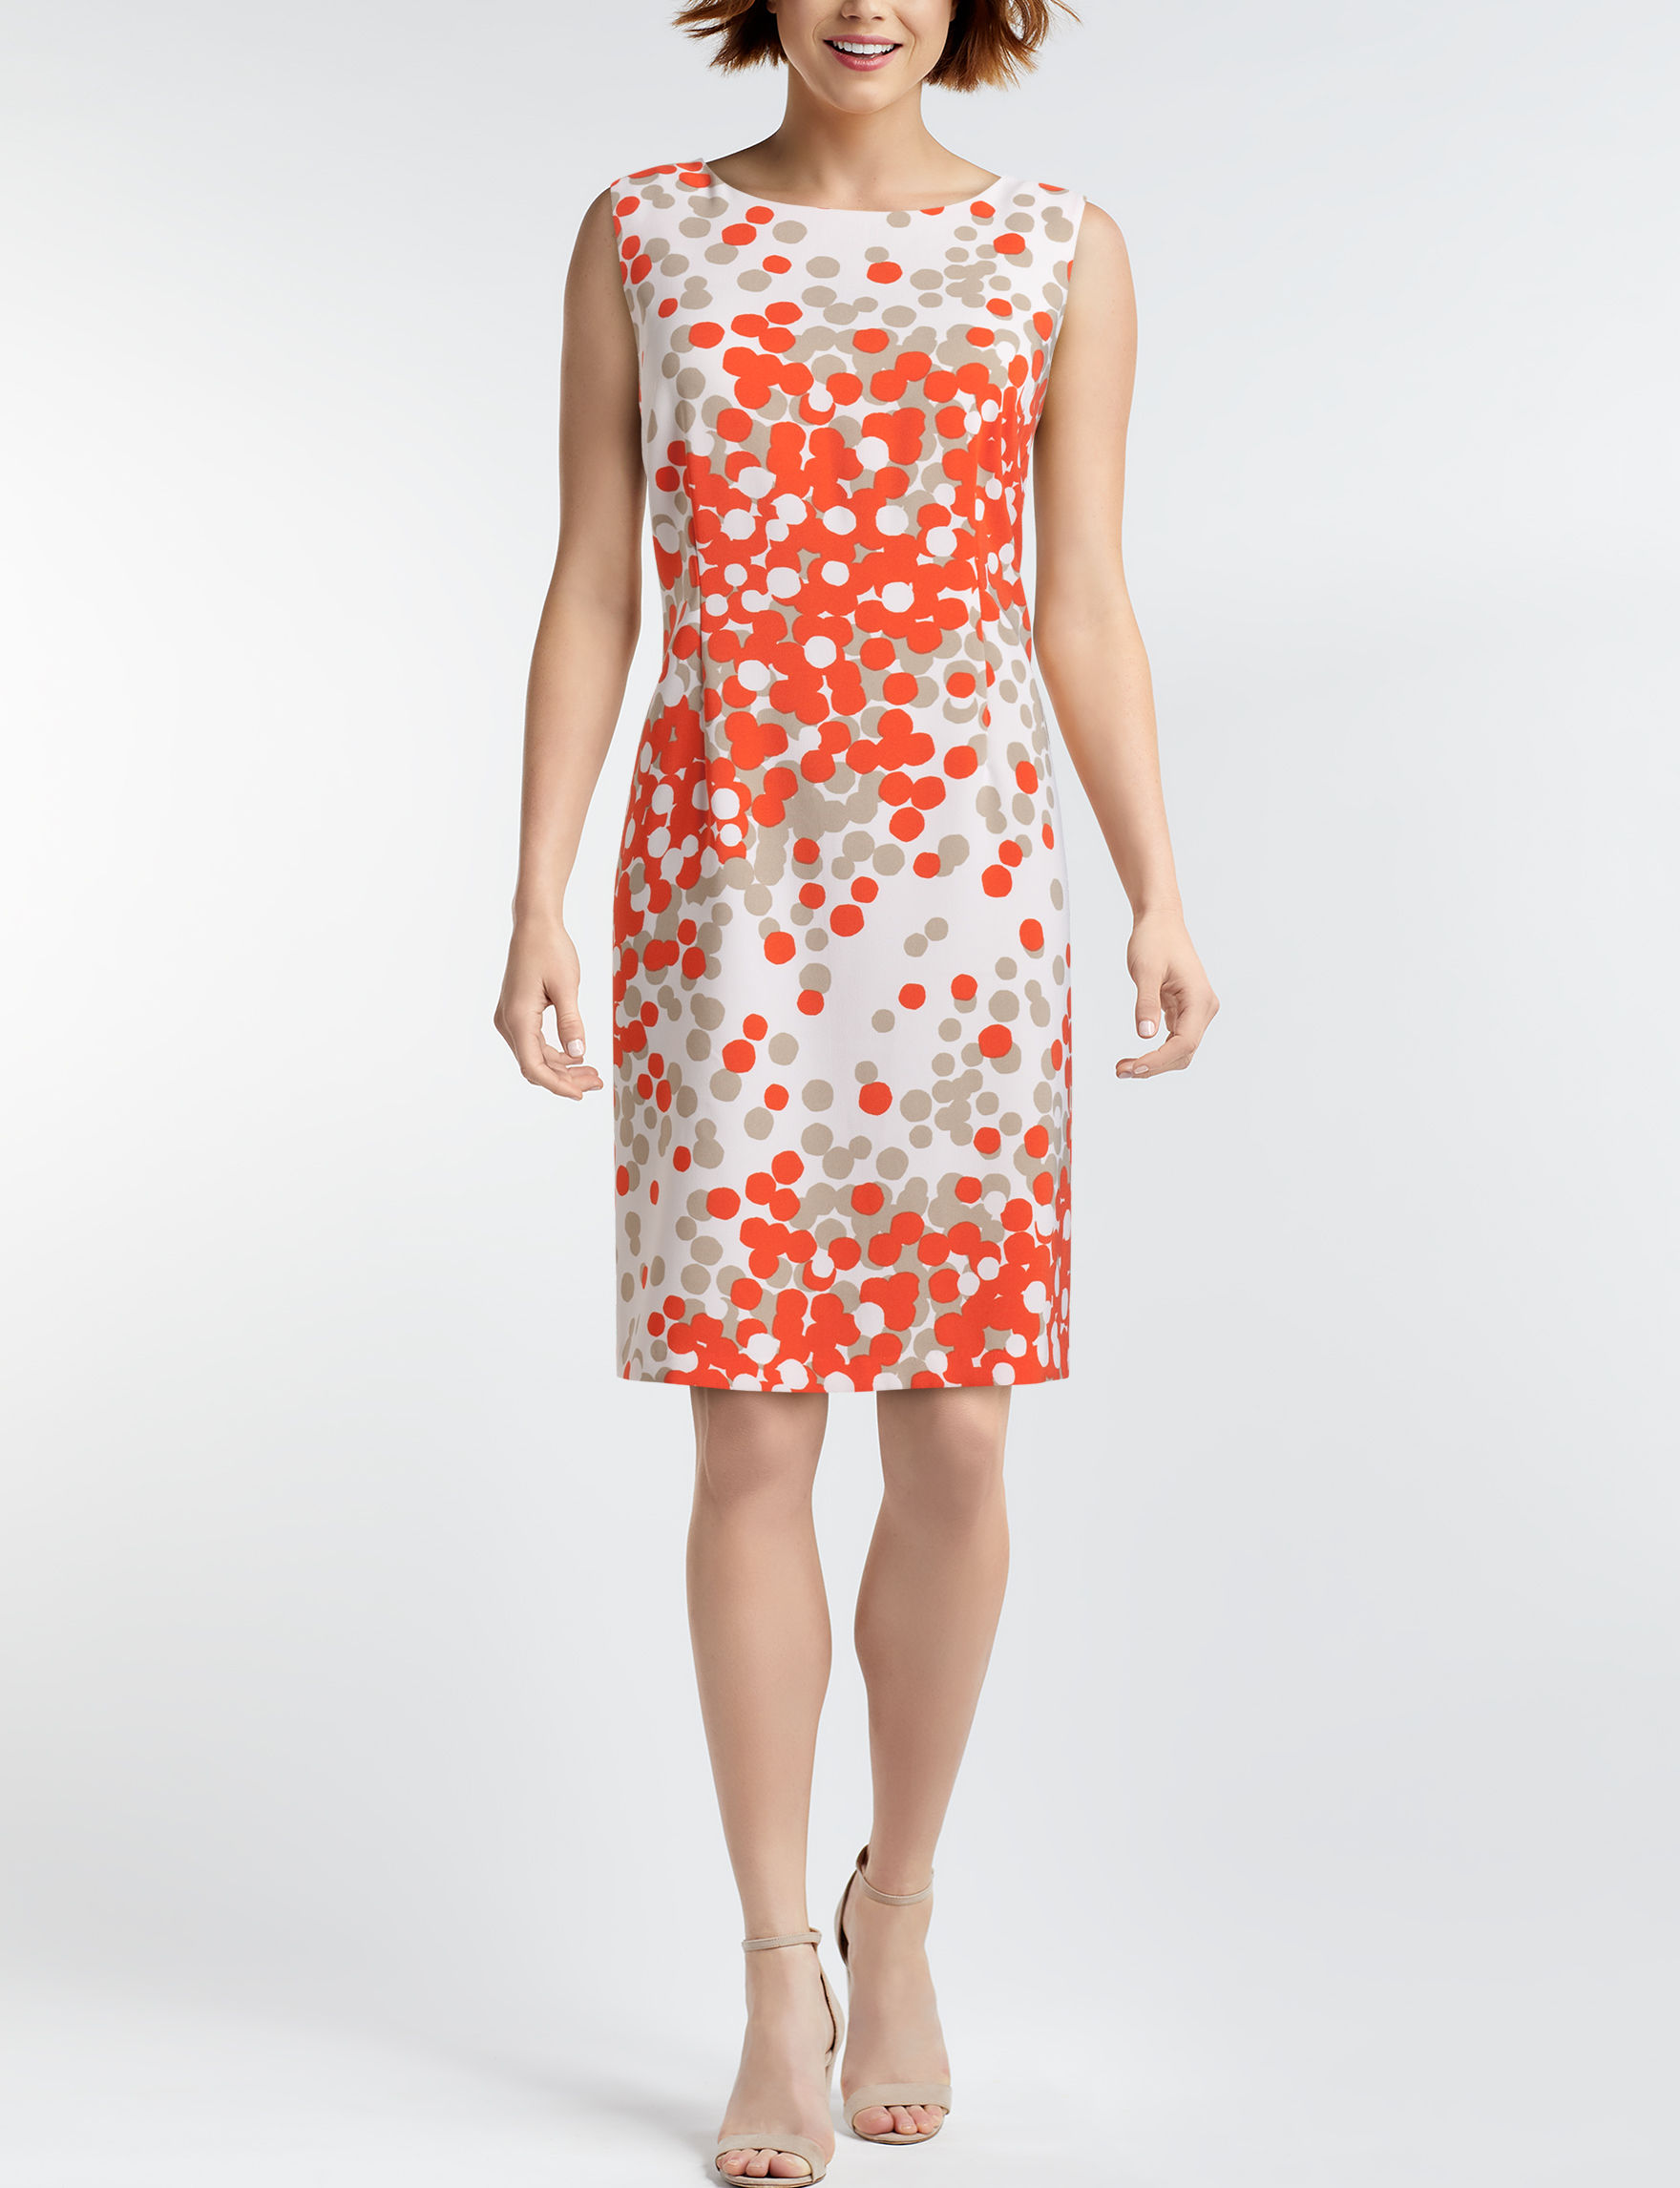 Ronni Nicole White / Orange Everyday & Casual Sheath Dresses